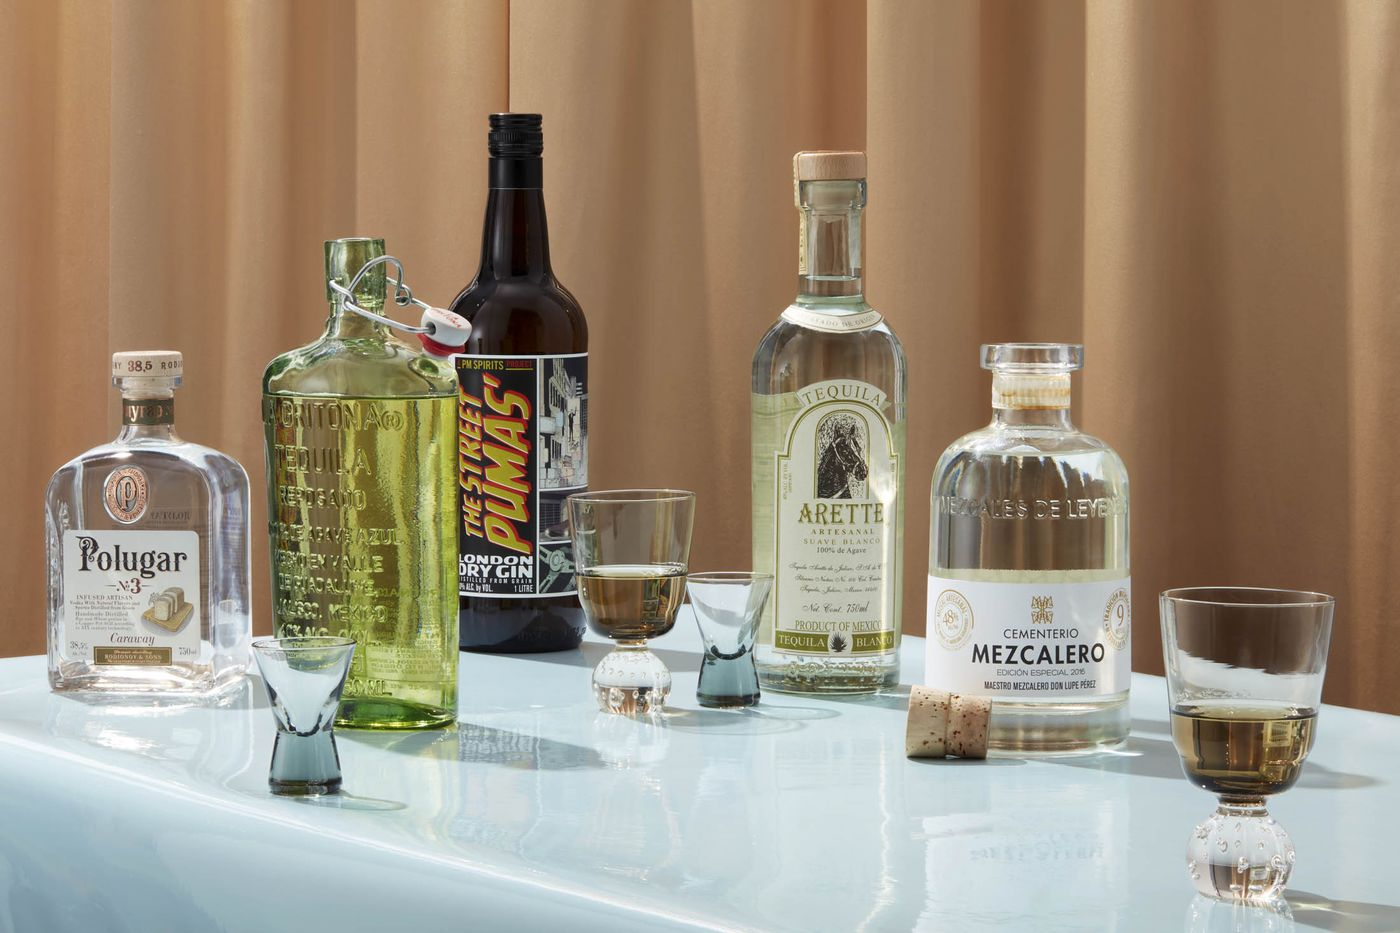 Polugar No. 3 vodka, La Gritona tequila, Street Pumas gin, Arette Artesenal Suave tequila,Mezcal de Leyenda Grandes Unicos.